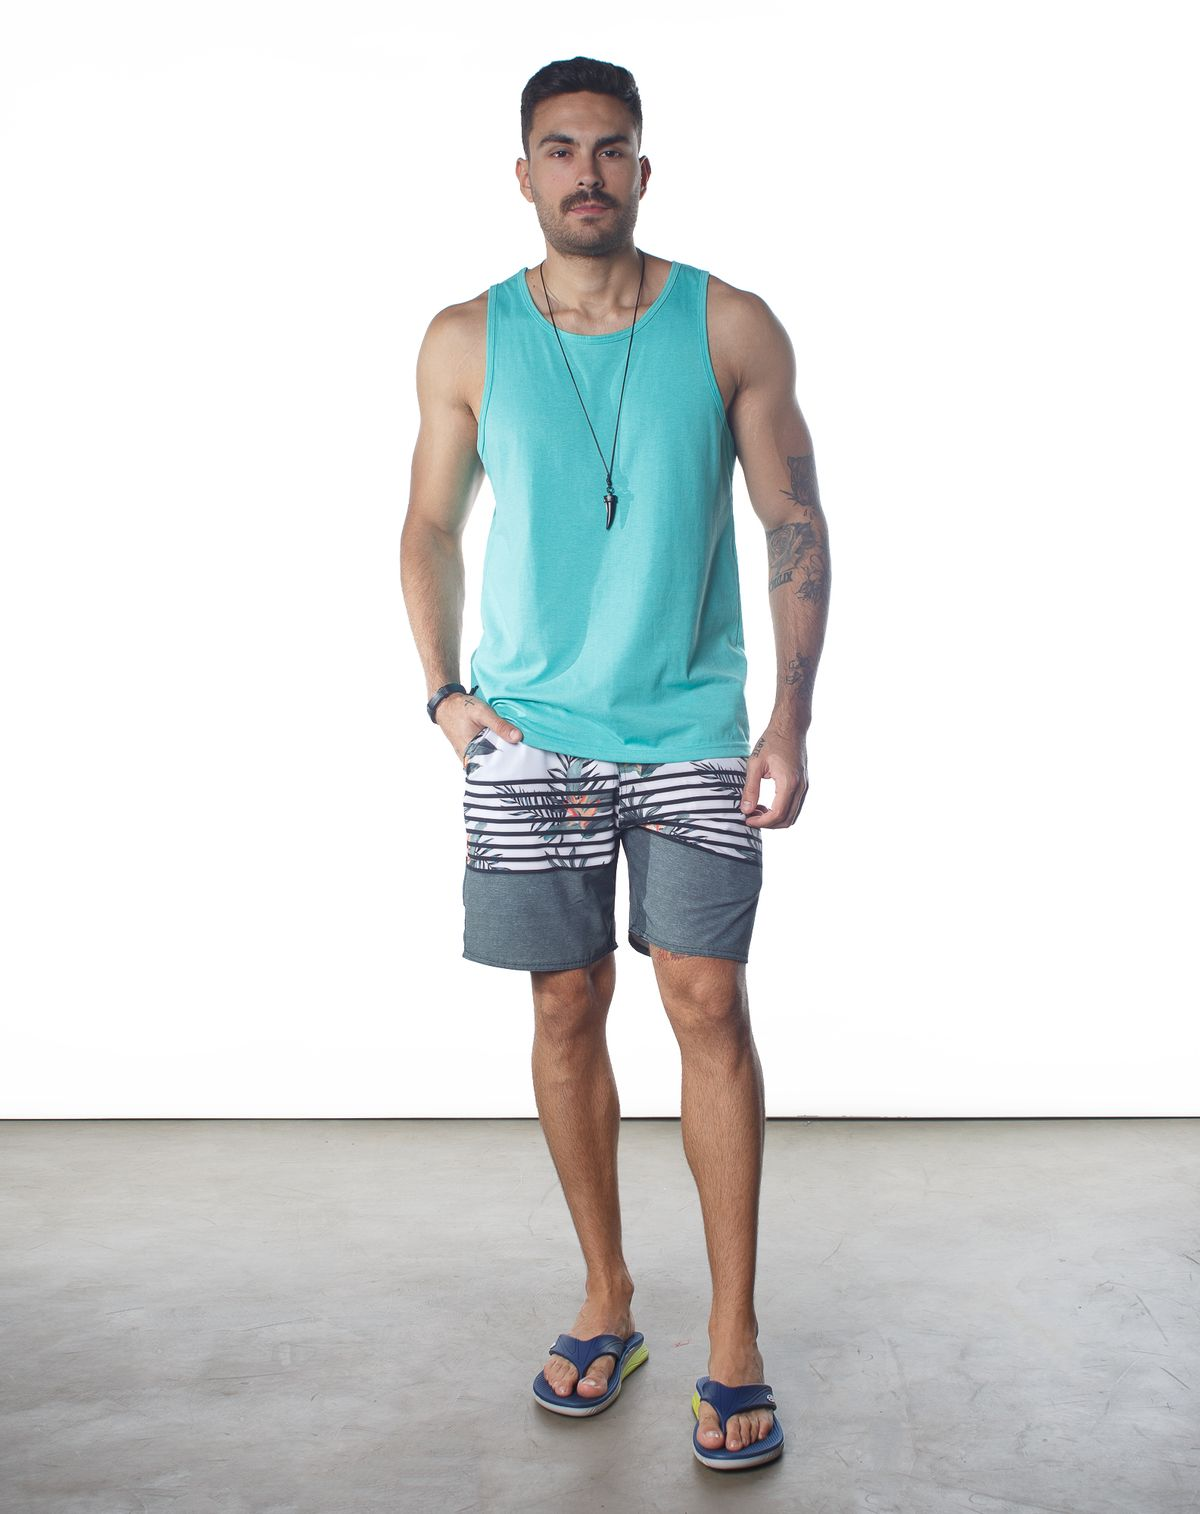 560326001-short-agua-masculino-estampa-tropical-listras-branco-p-b92